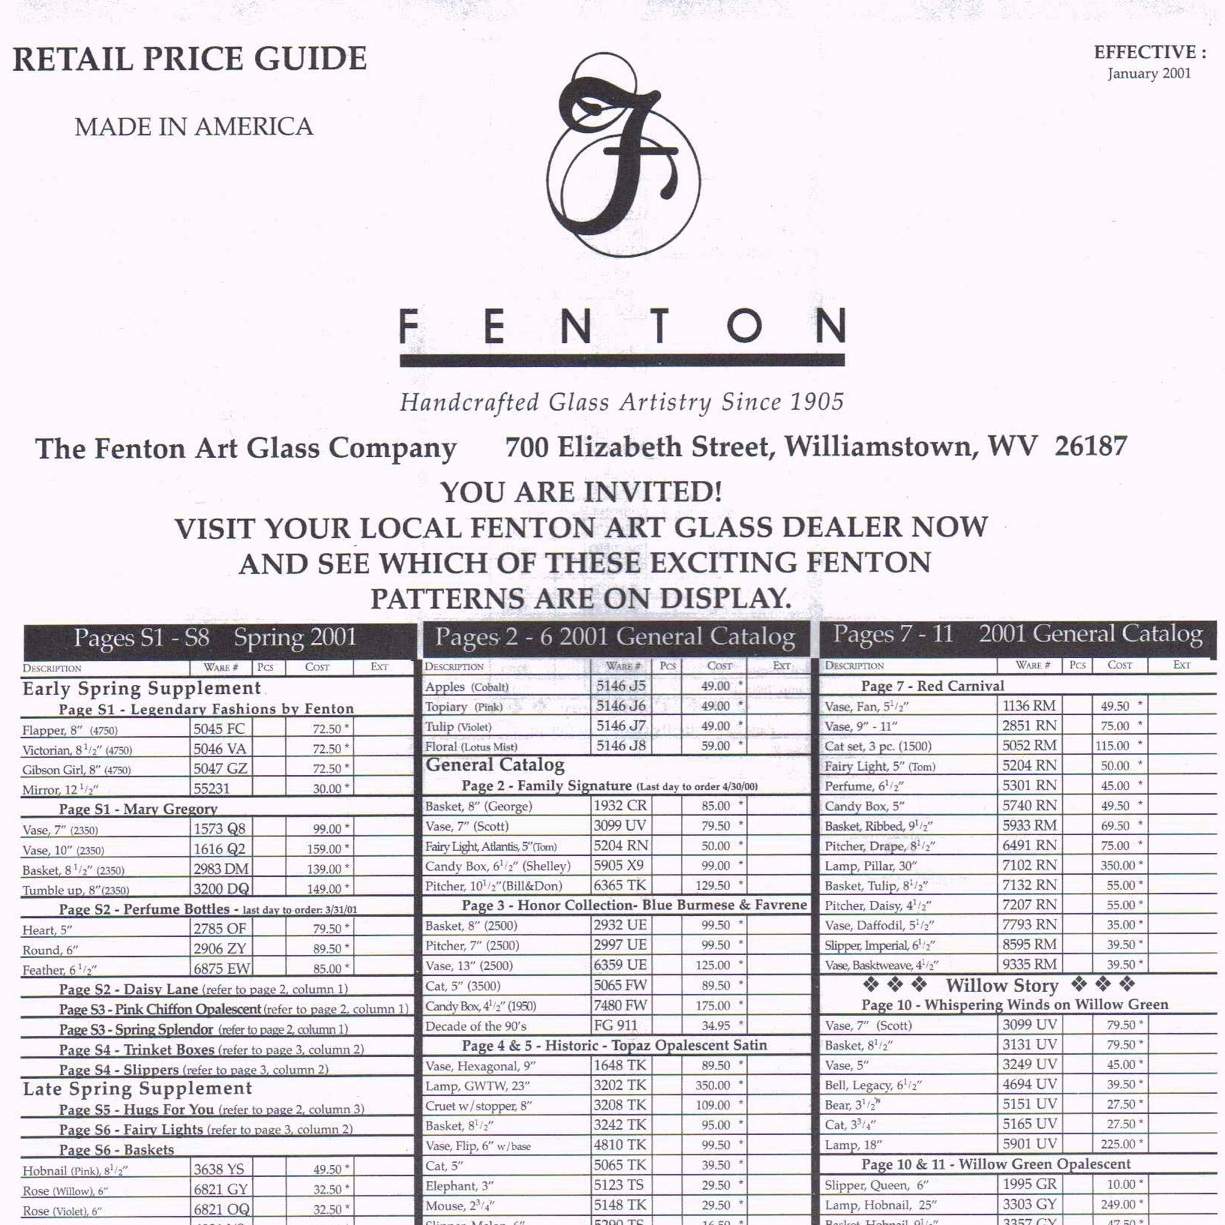 2001 Jan Price Guide